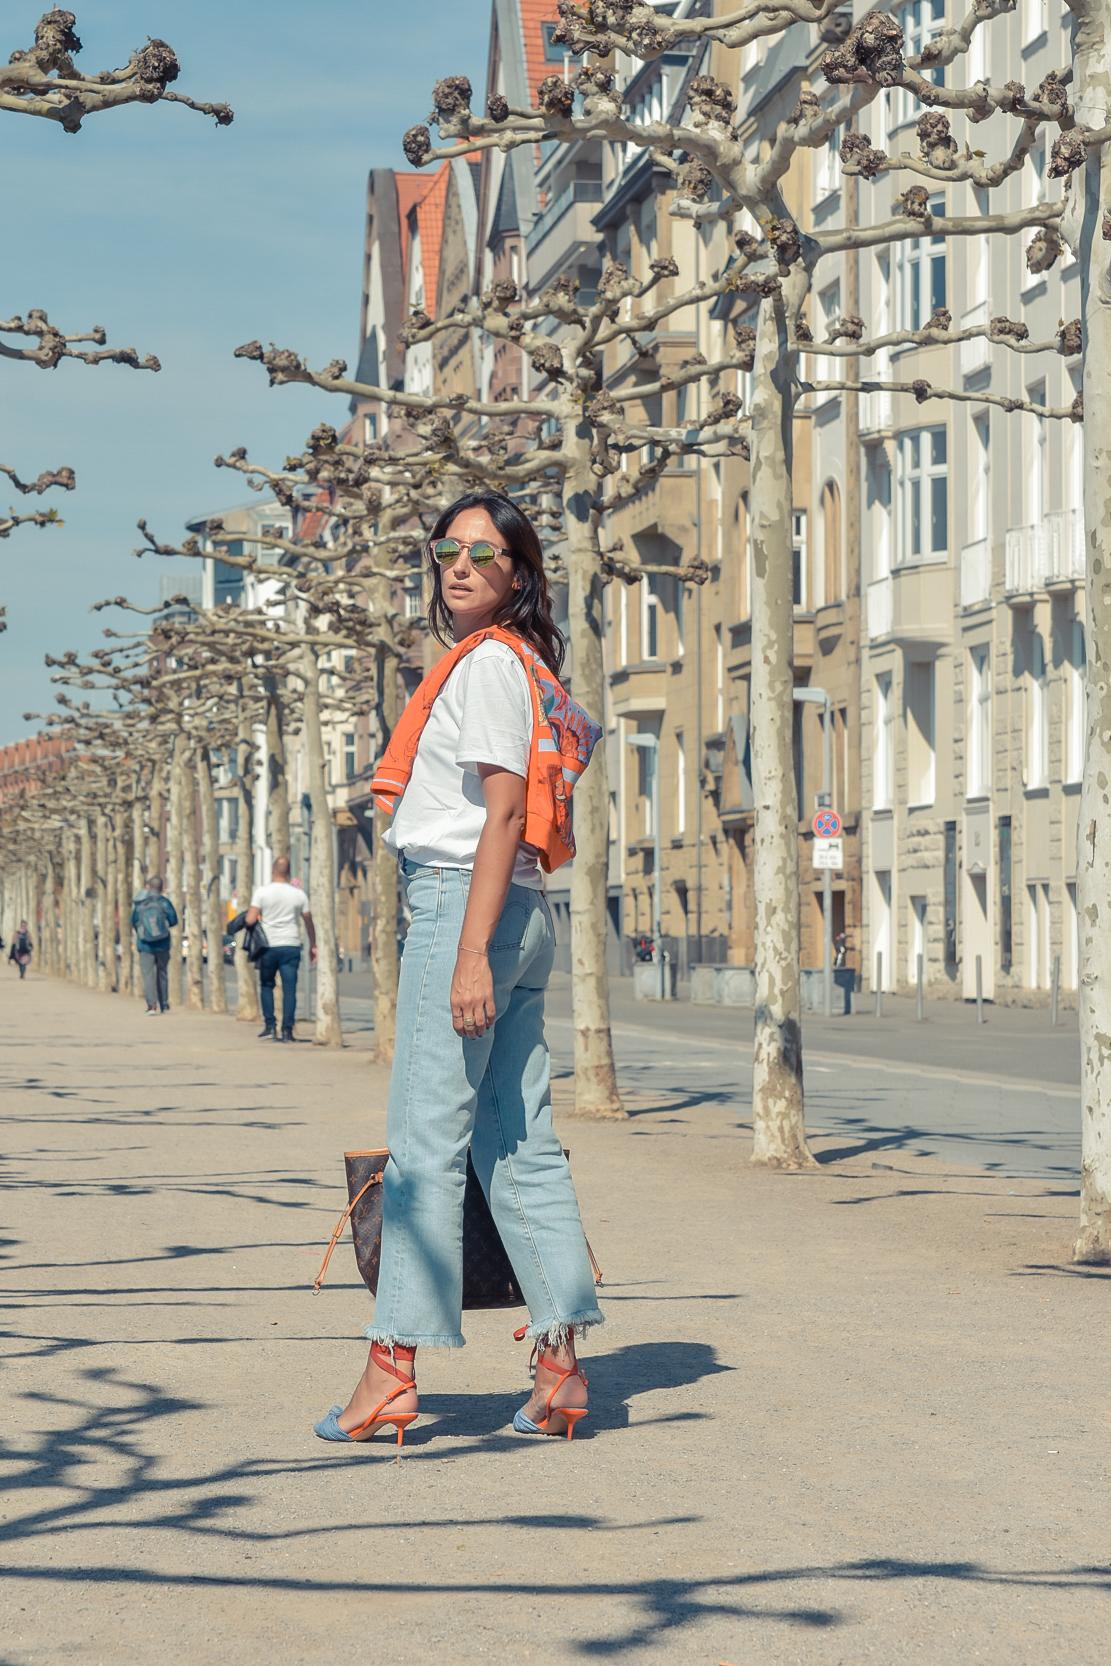 el-blog-de-silvia-viajar-dusseldorf-jersey-geometrico-jeans-levis-01